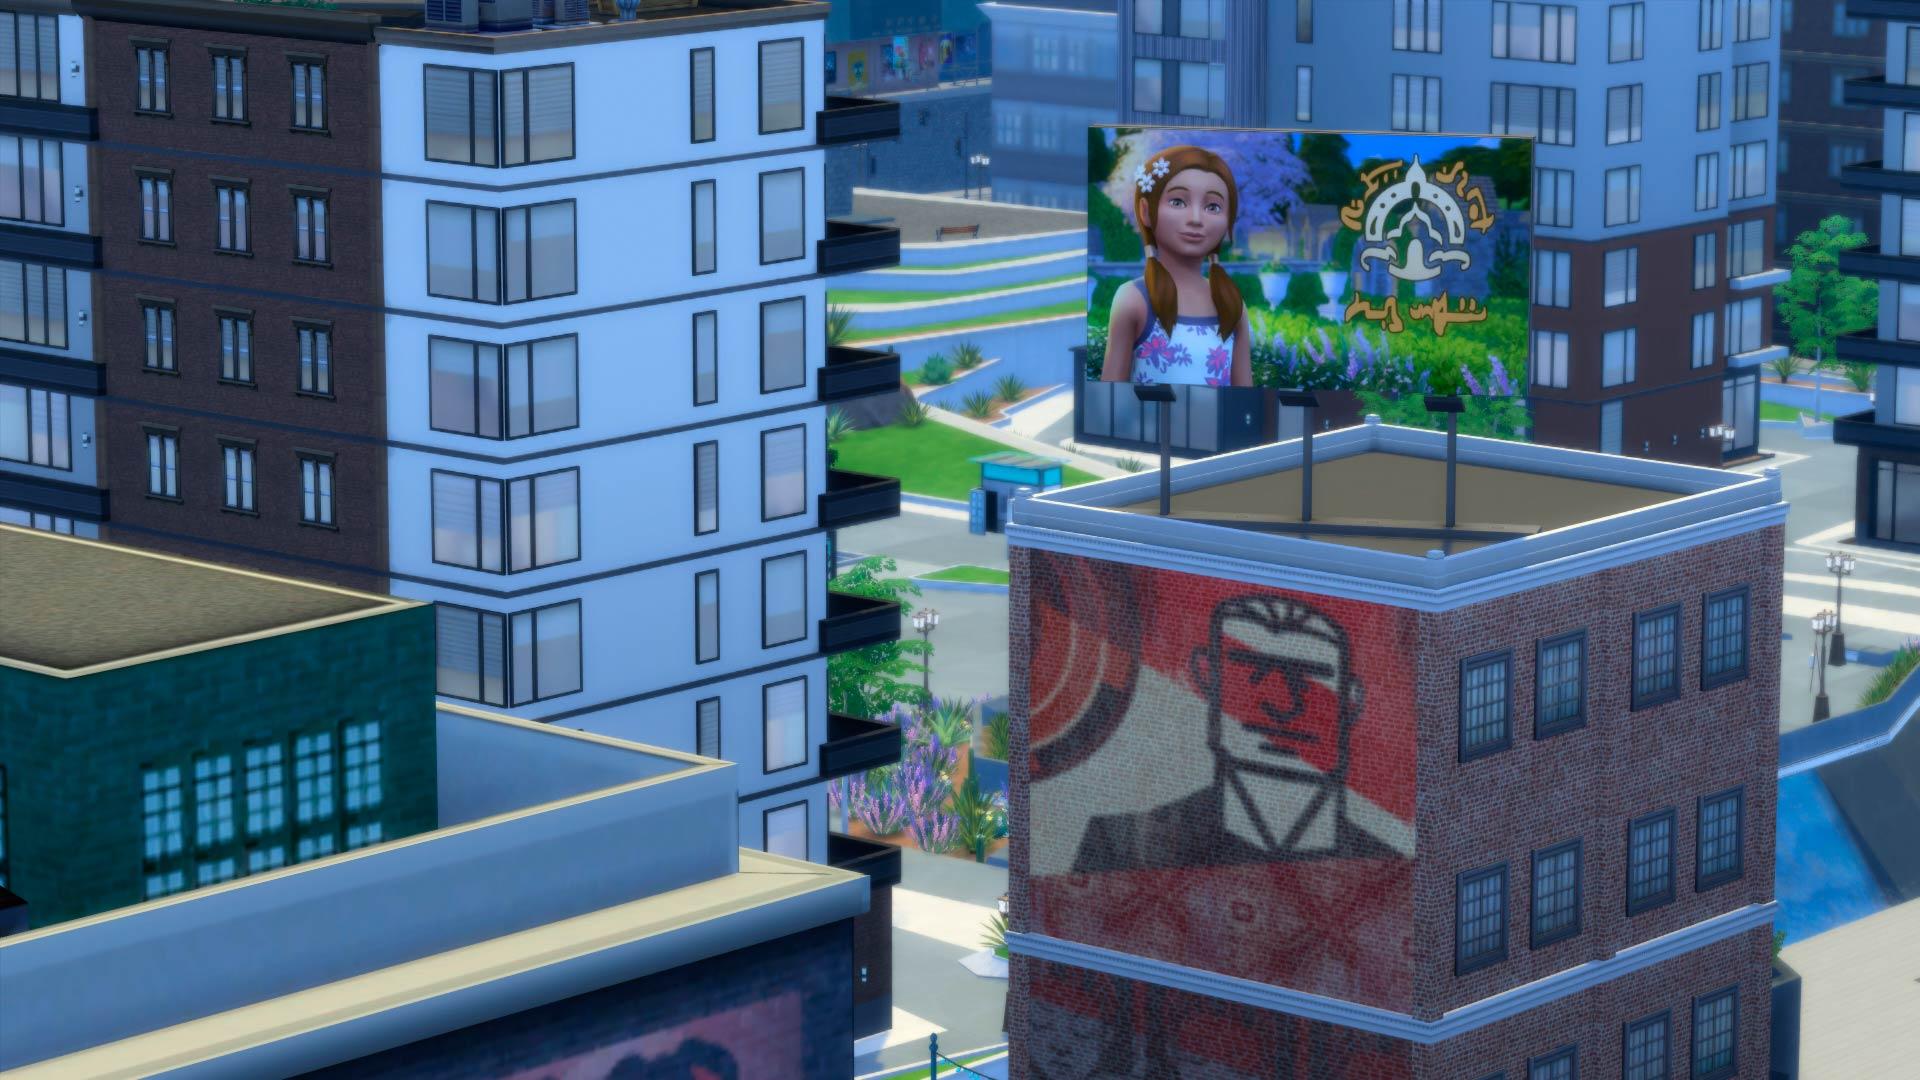 Los sims 4 urbanitas an lisis de la expansi n para pc for Mods sims 4 muebles